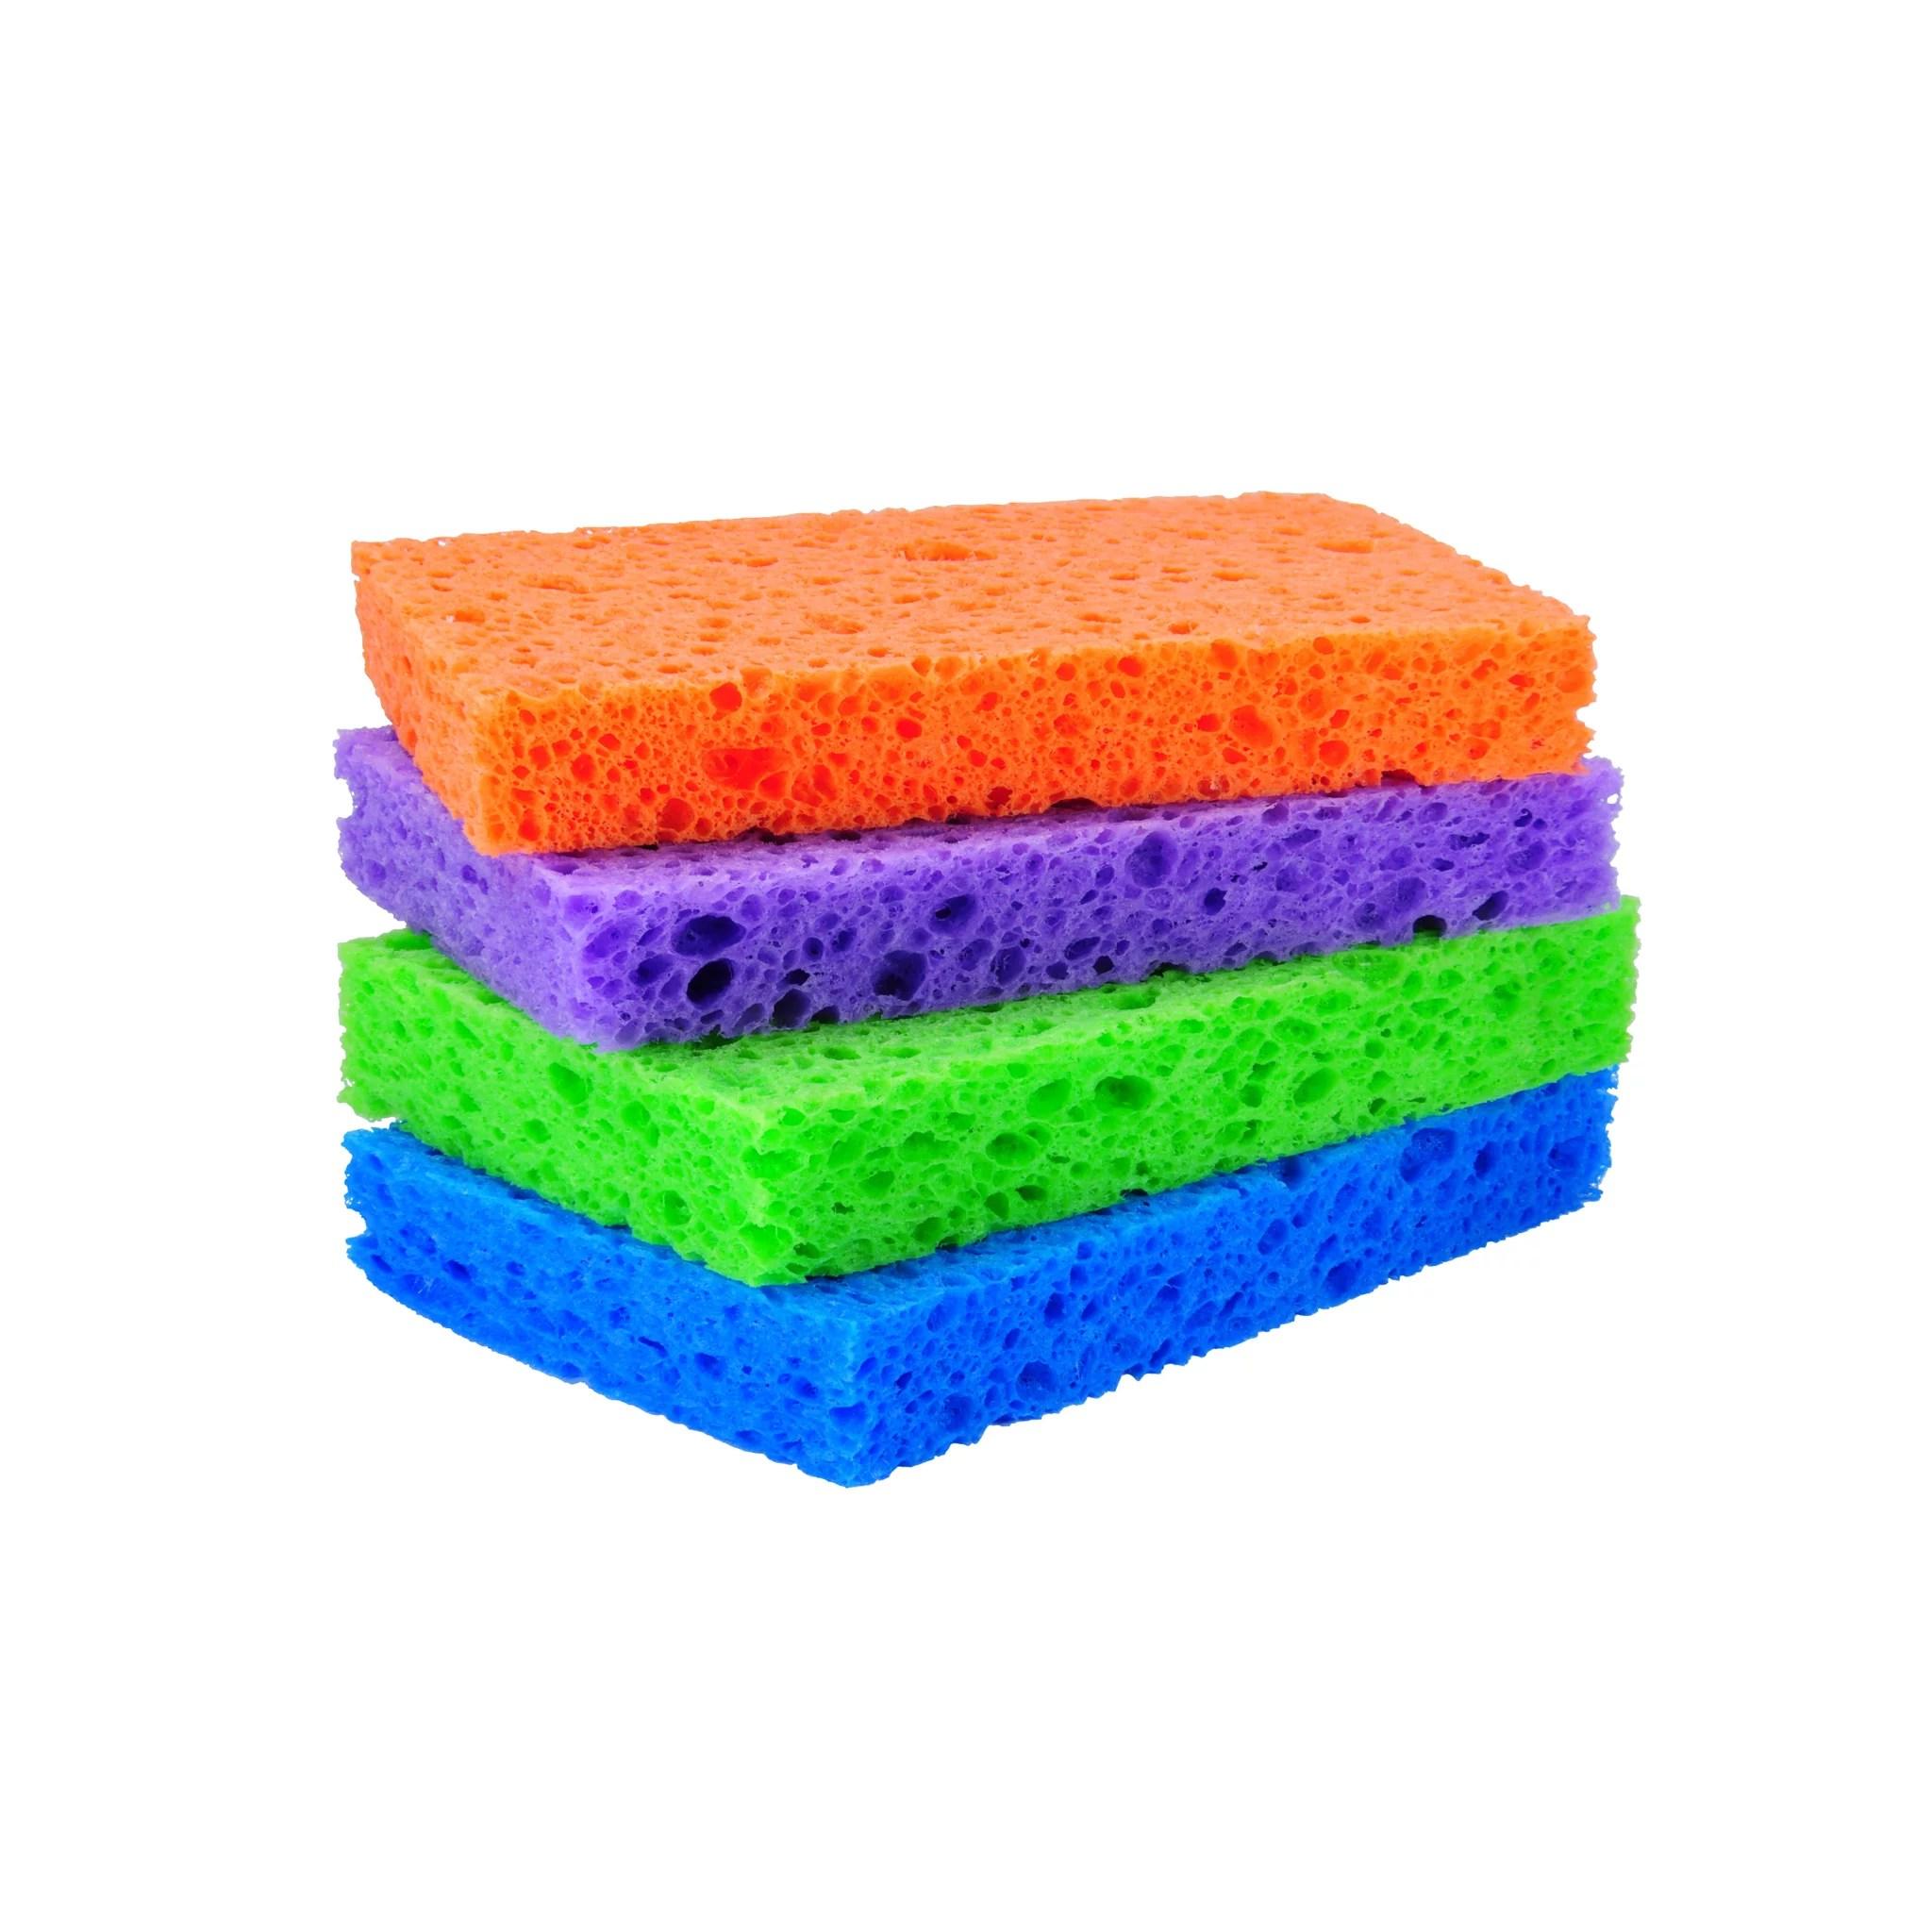 How To Clean A Sponge Popsugar Smart Living